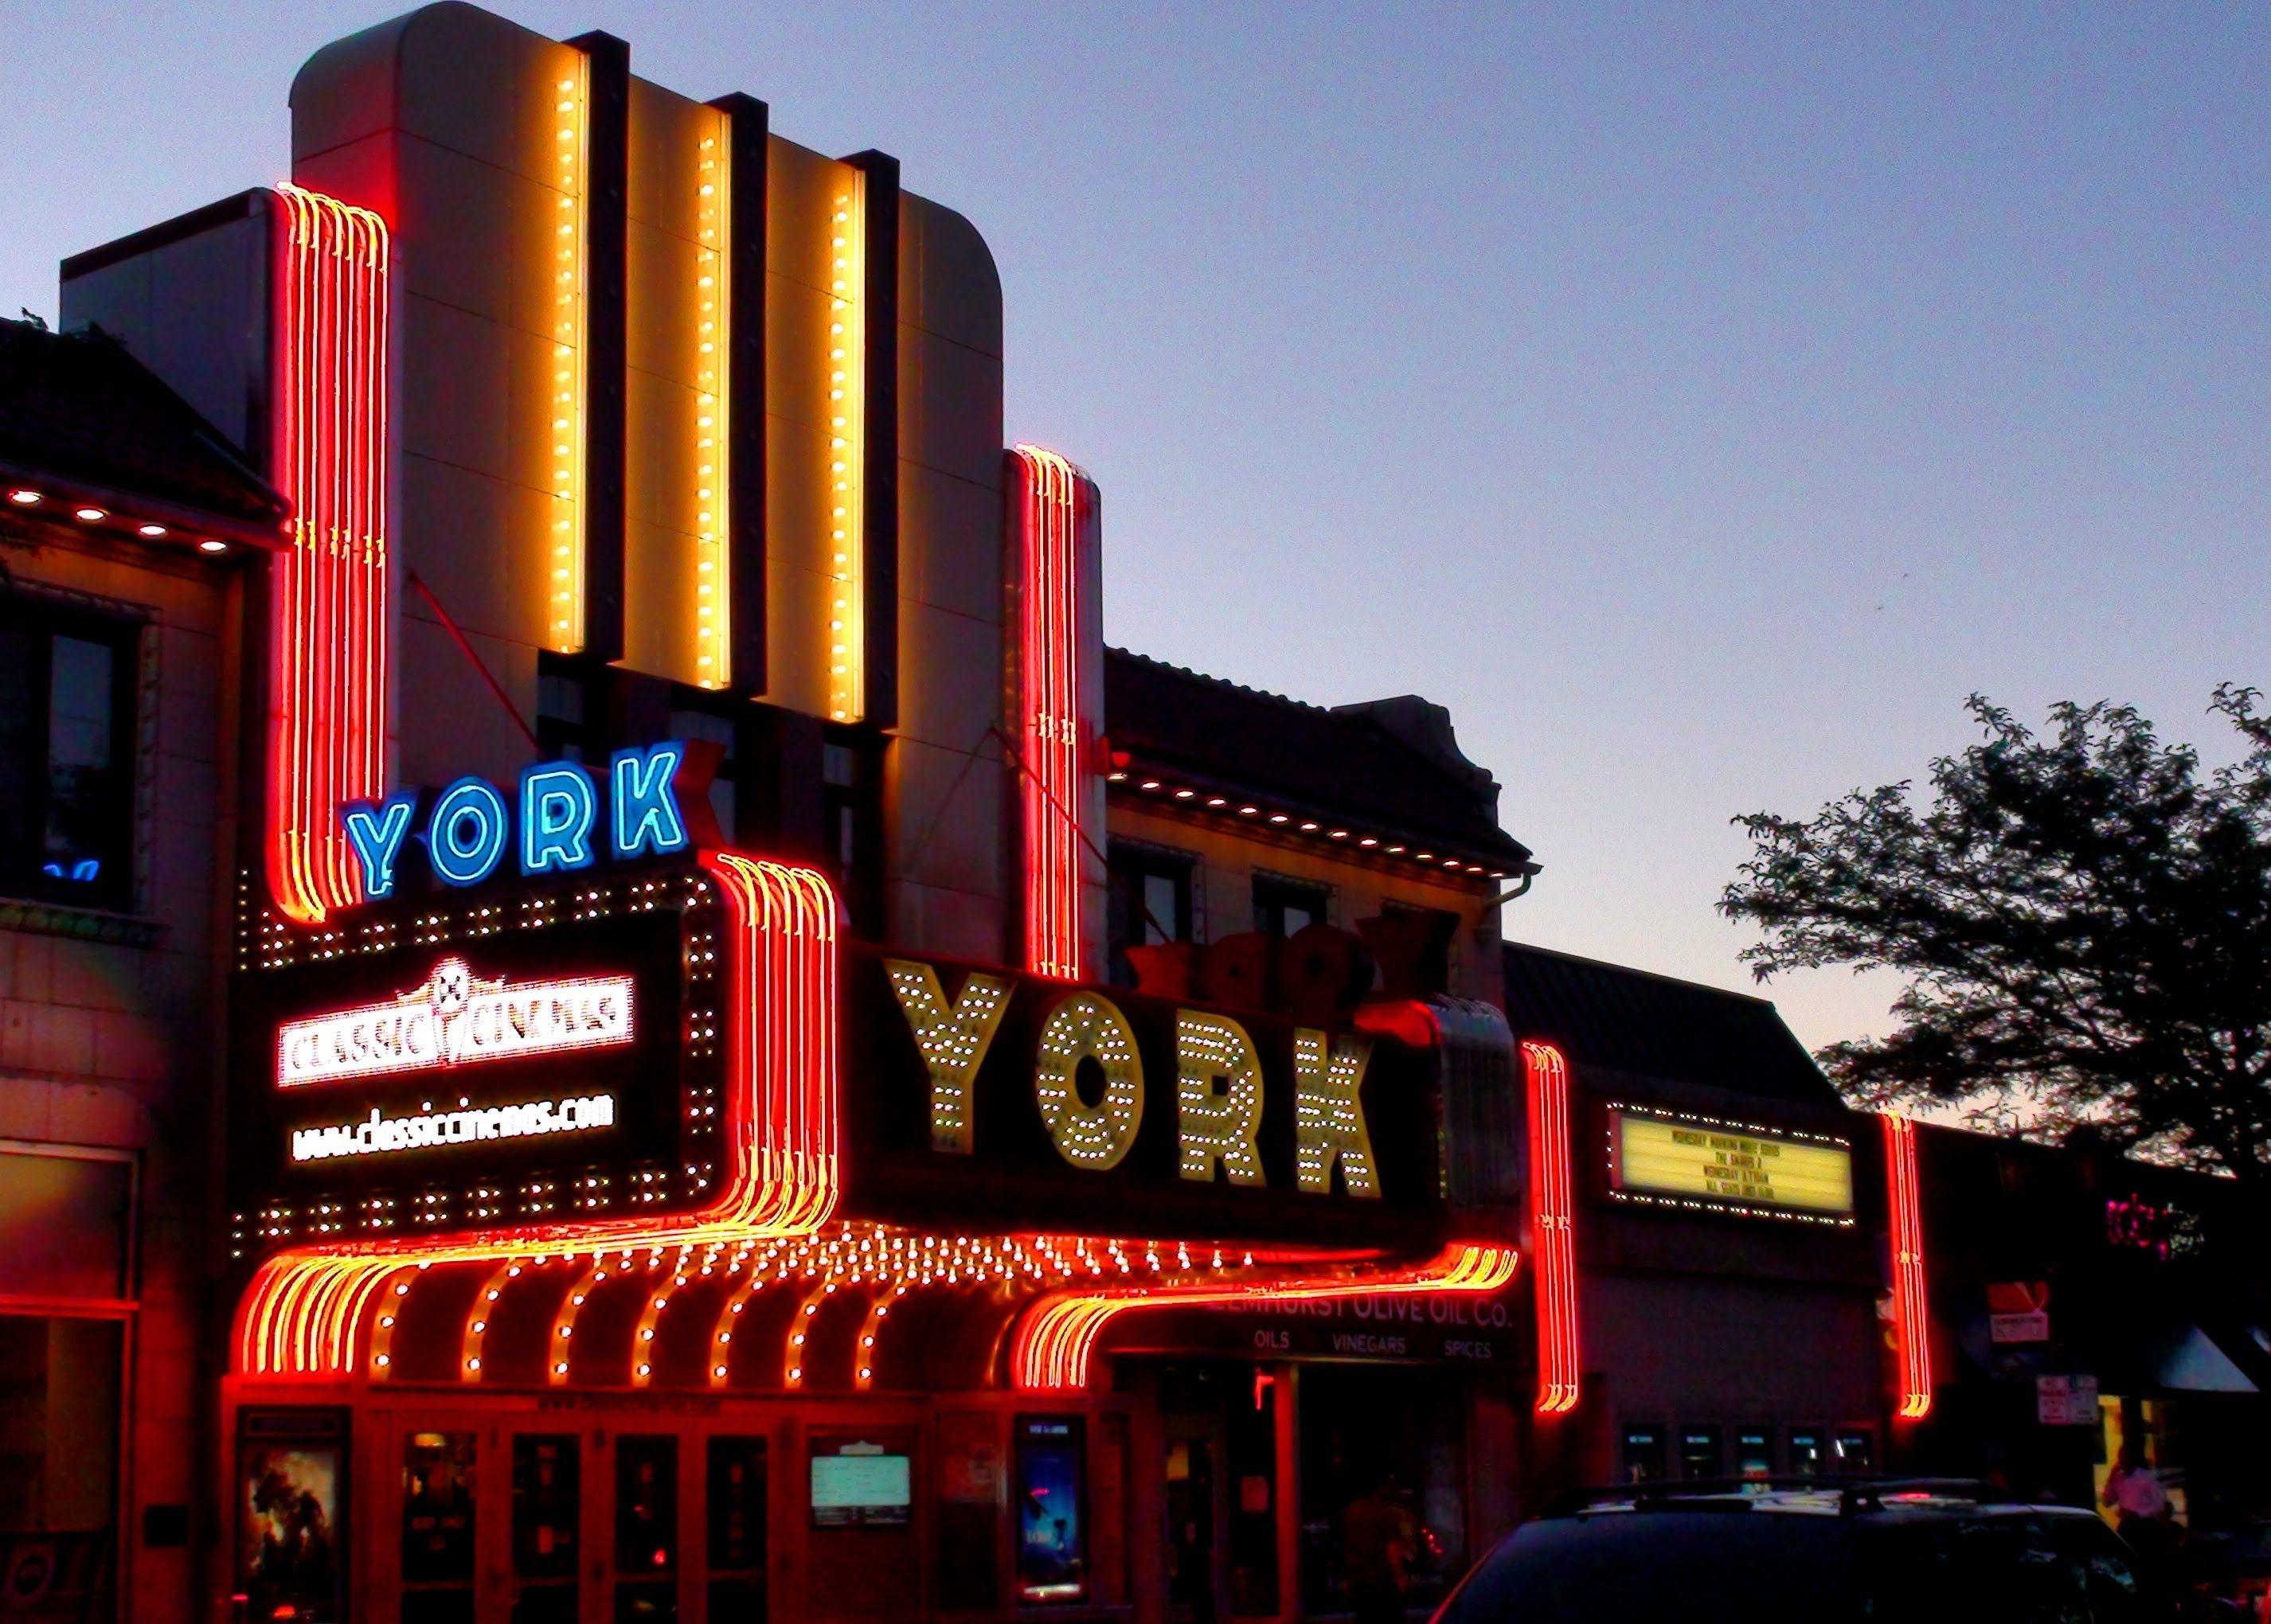 York Theater Marquee, Restored Gem In Elmhurst Il  - YouTube